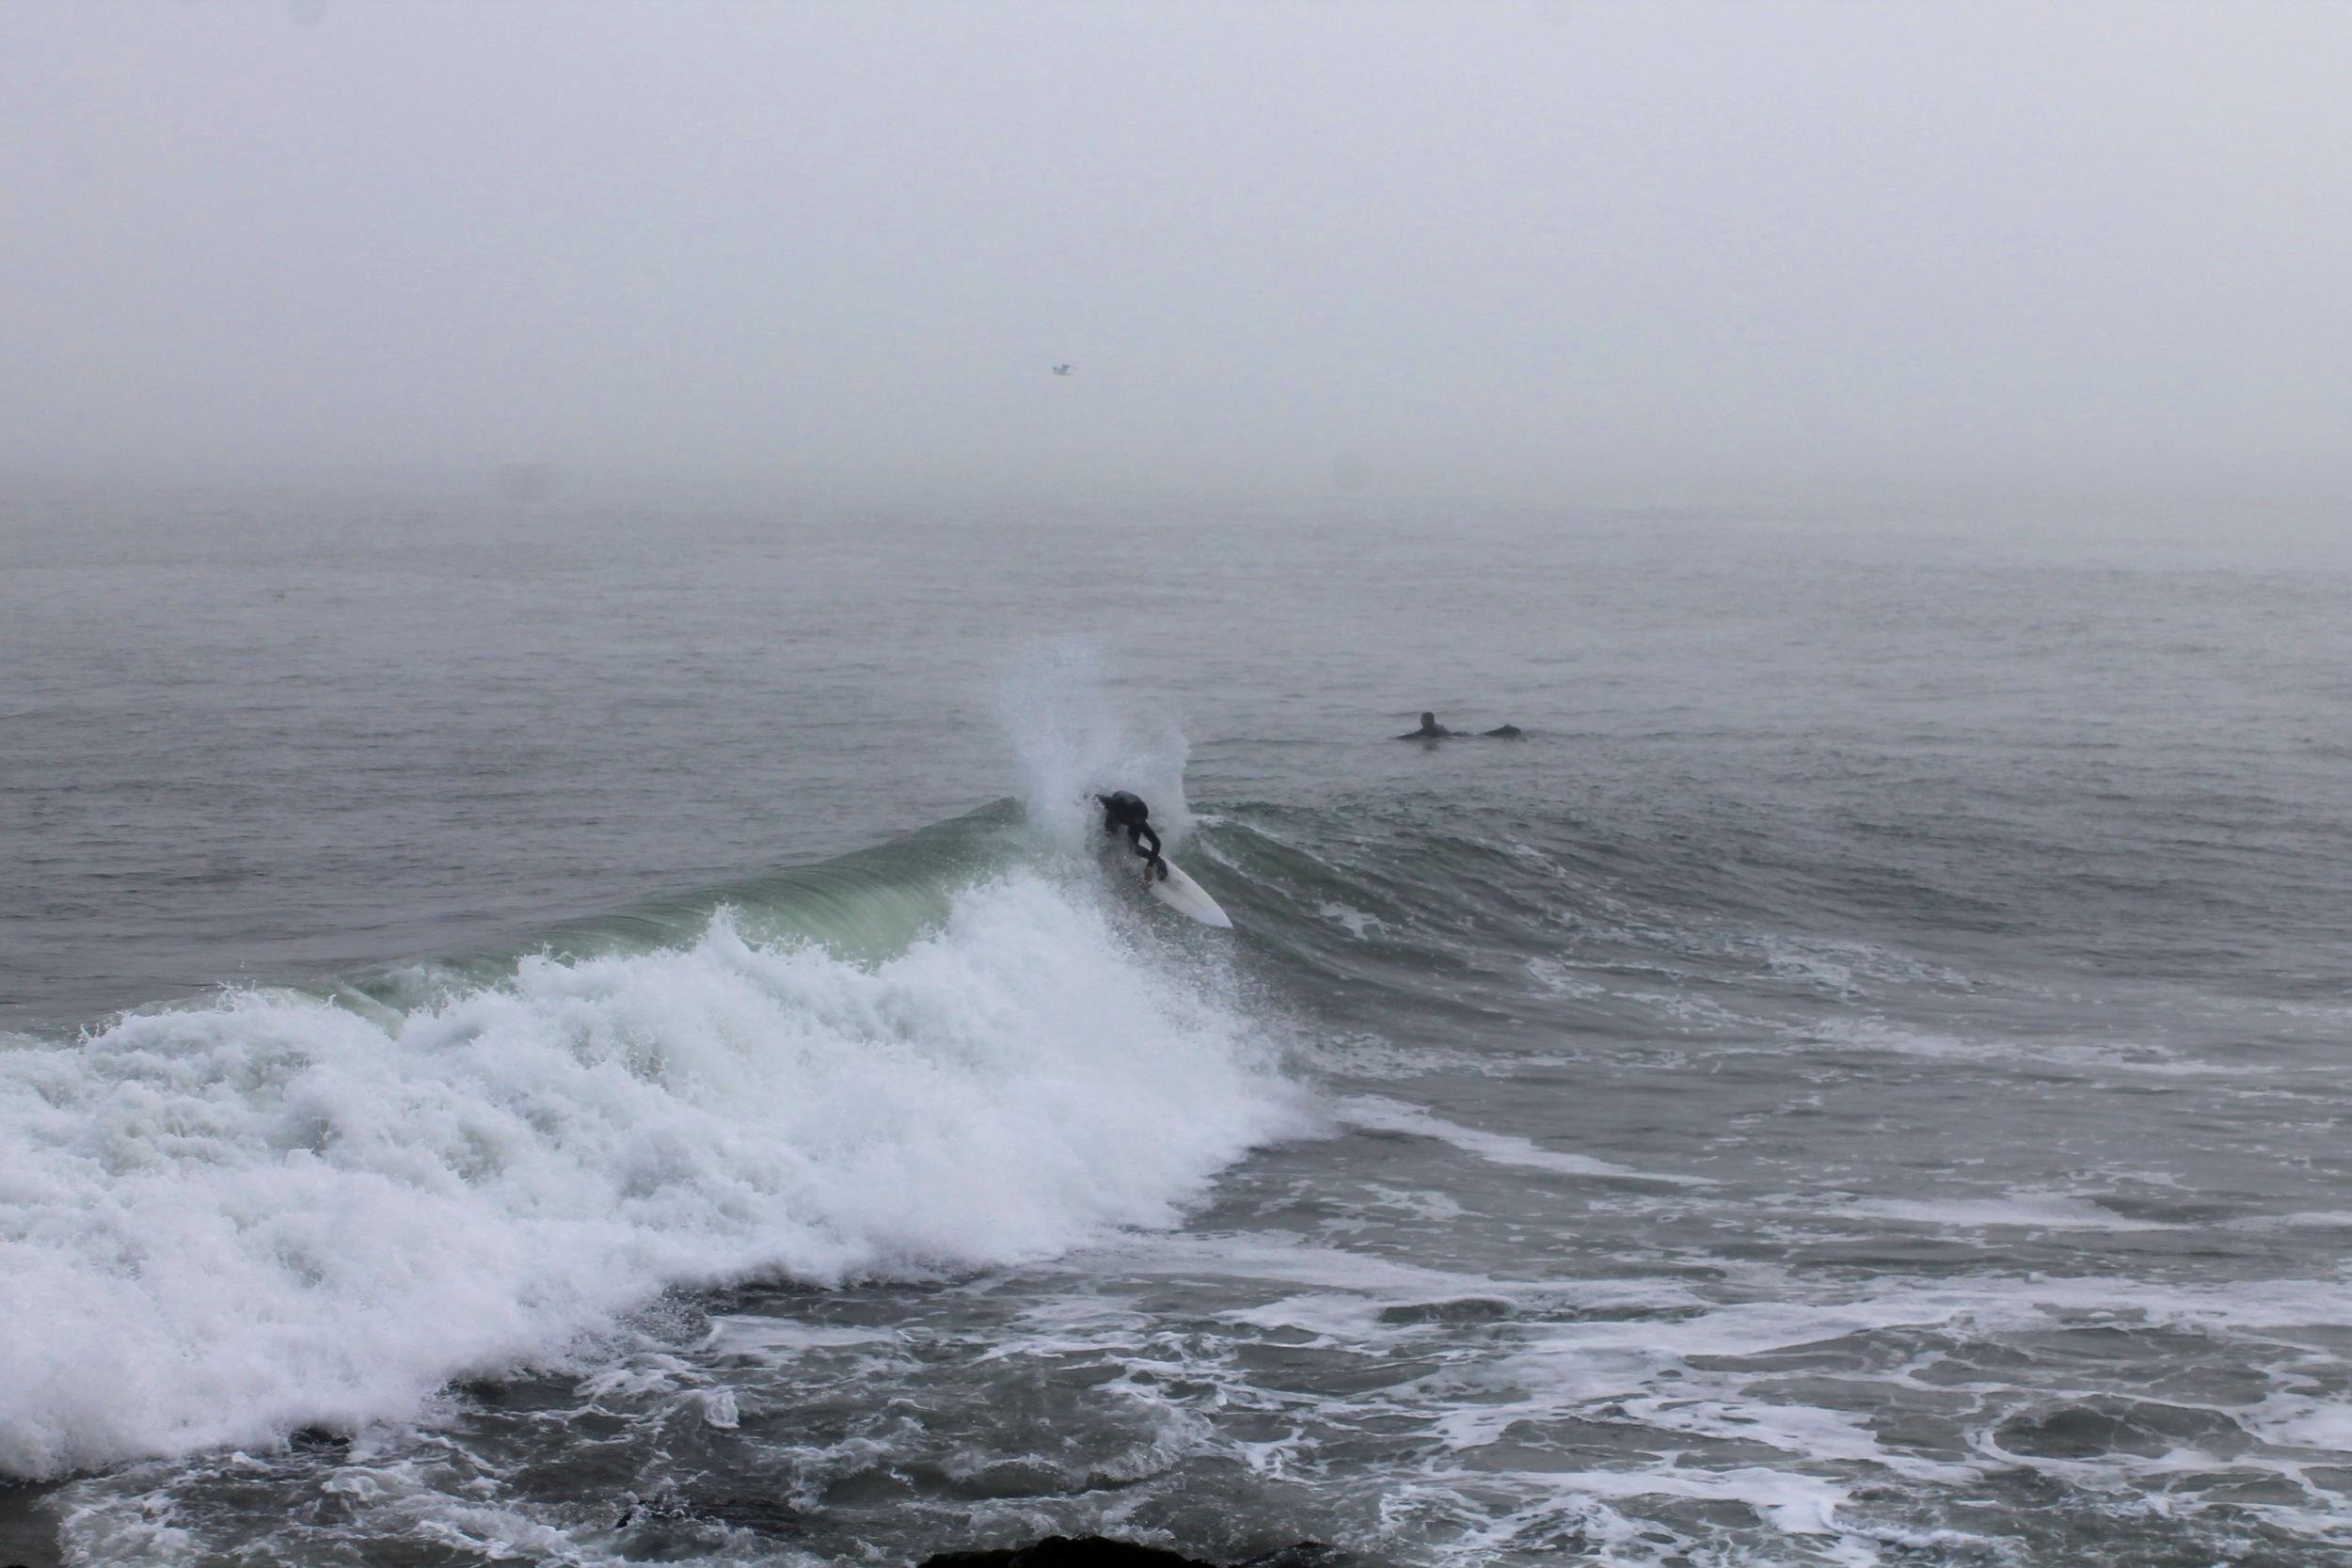 Surfing in San Francisco